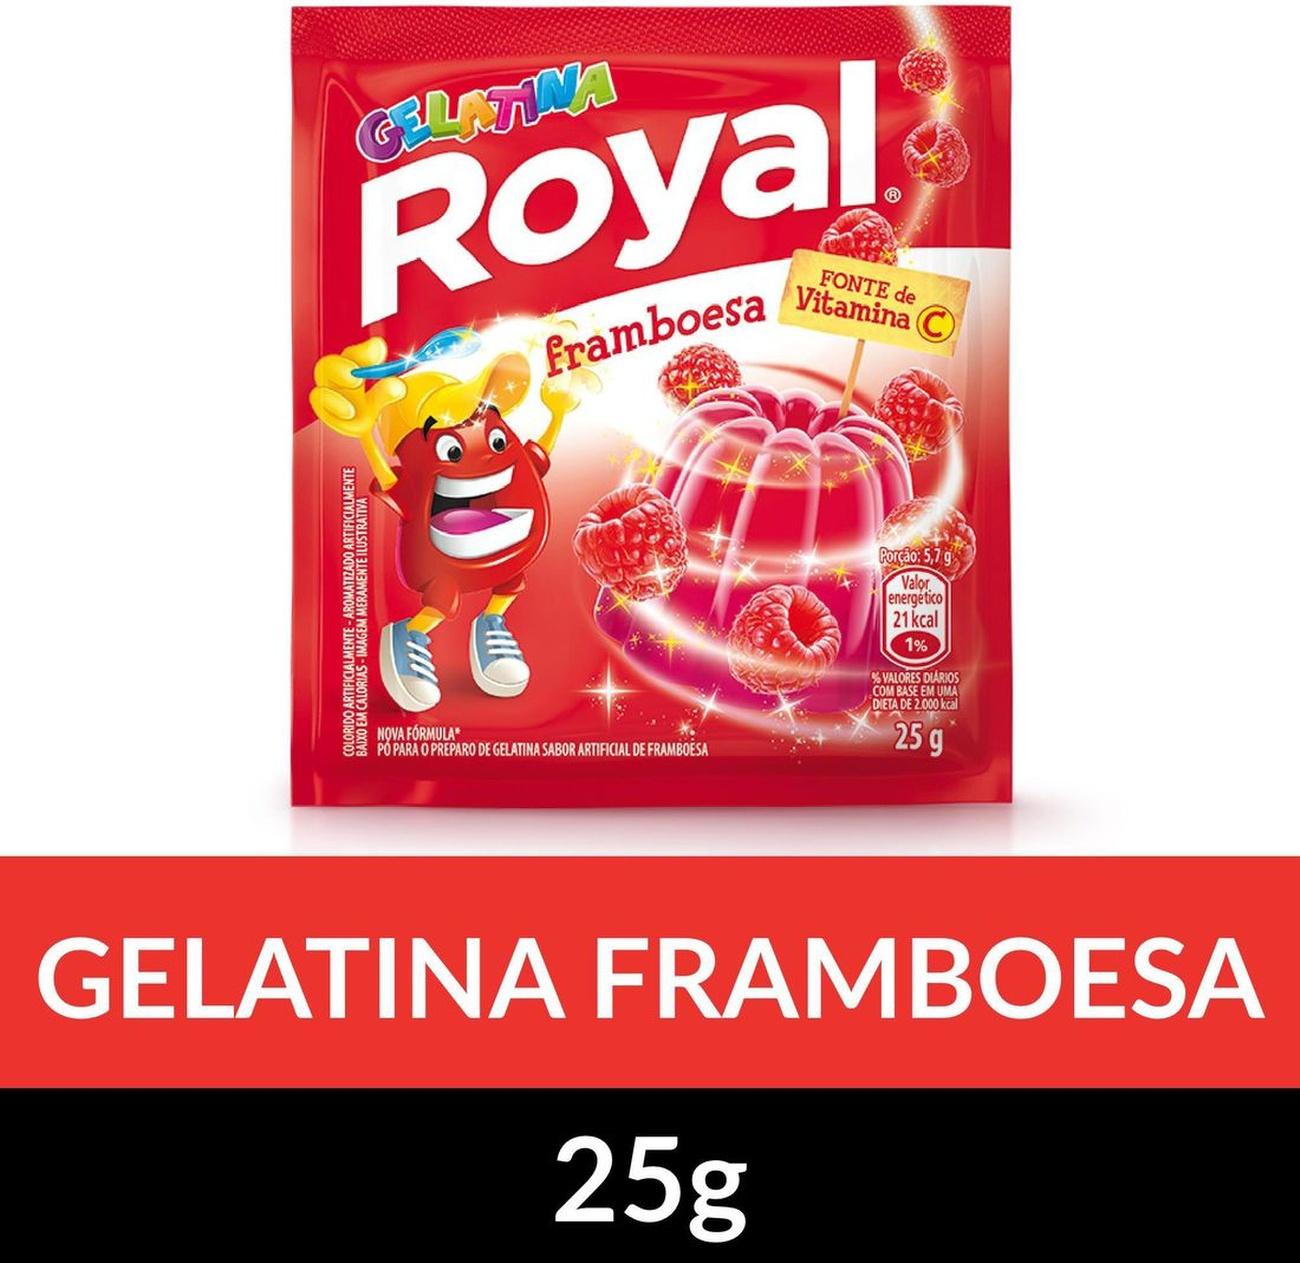 Gelatina em pó ROYAL Framboesa 25g